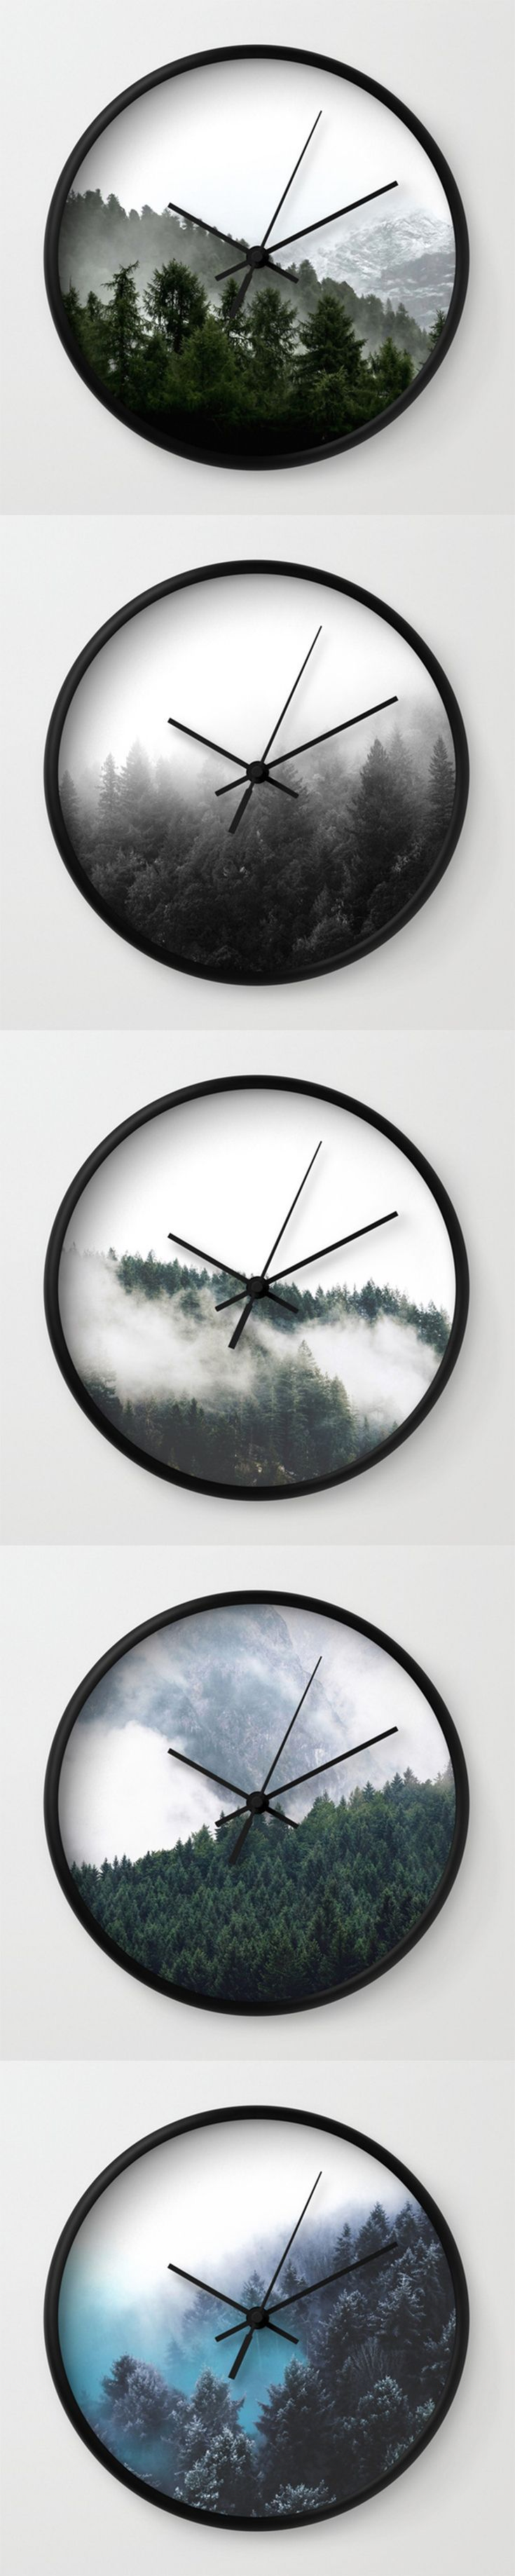 Modern Forest Wall Clocks by Neptune Essentials on Society6  Home Decor, Wall Decor, Wall Clocks, Hanging Clocks, Minimalist Clocks, Modern Designs, Decor Ideas, Bedroom Decor, Living Room Decor, Kitchen Ideas, Trends, Scandinavian, Nordic Designs